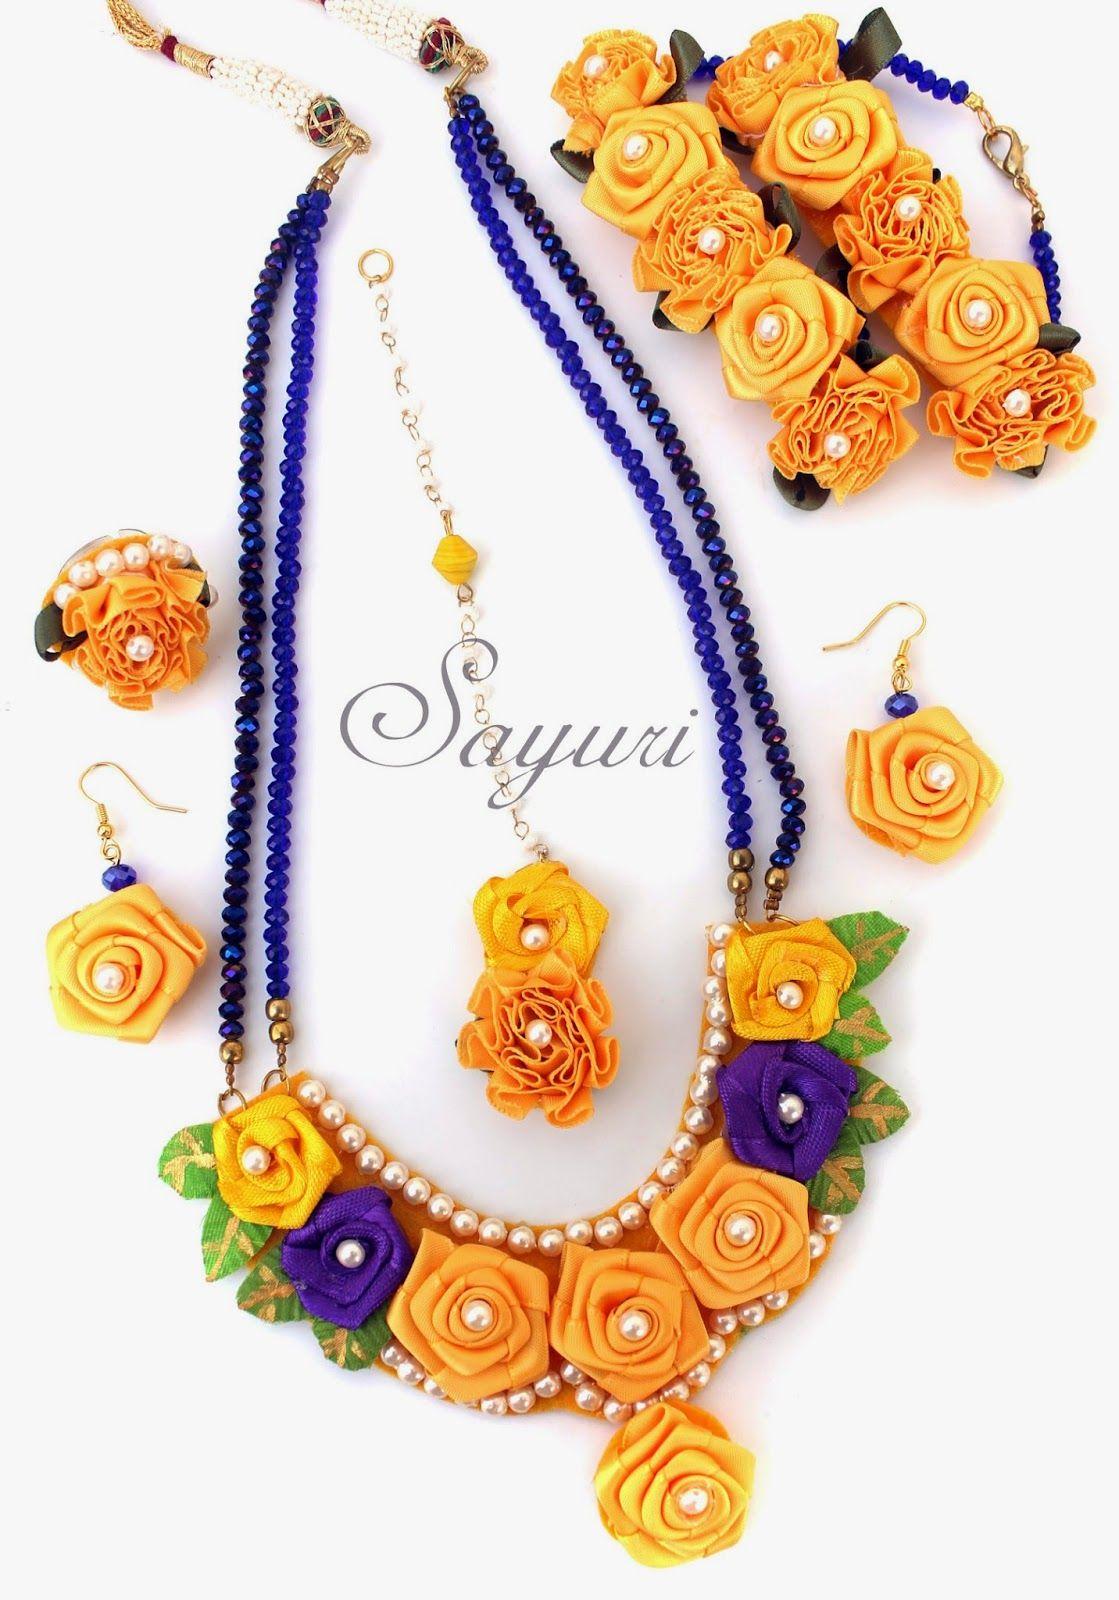 Ribbon flower jewelry for Haldi function Flower